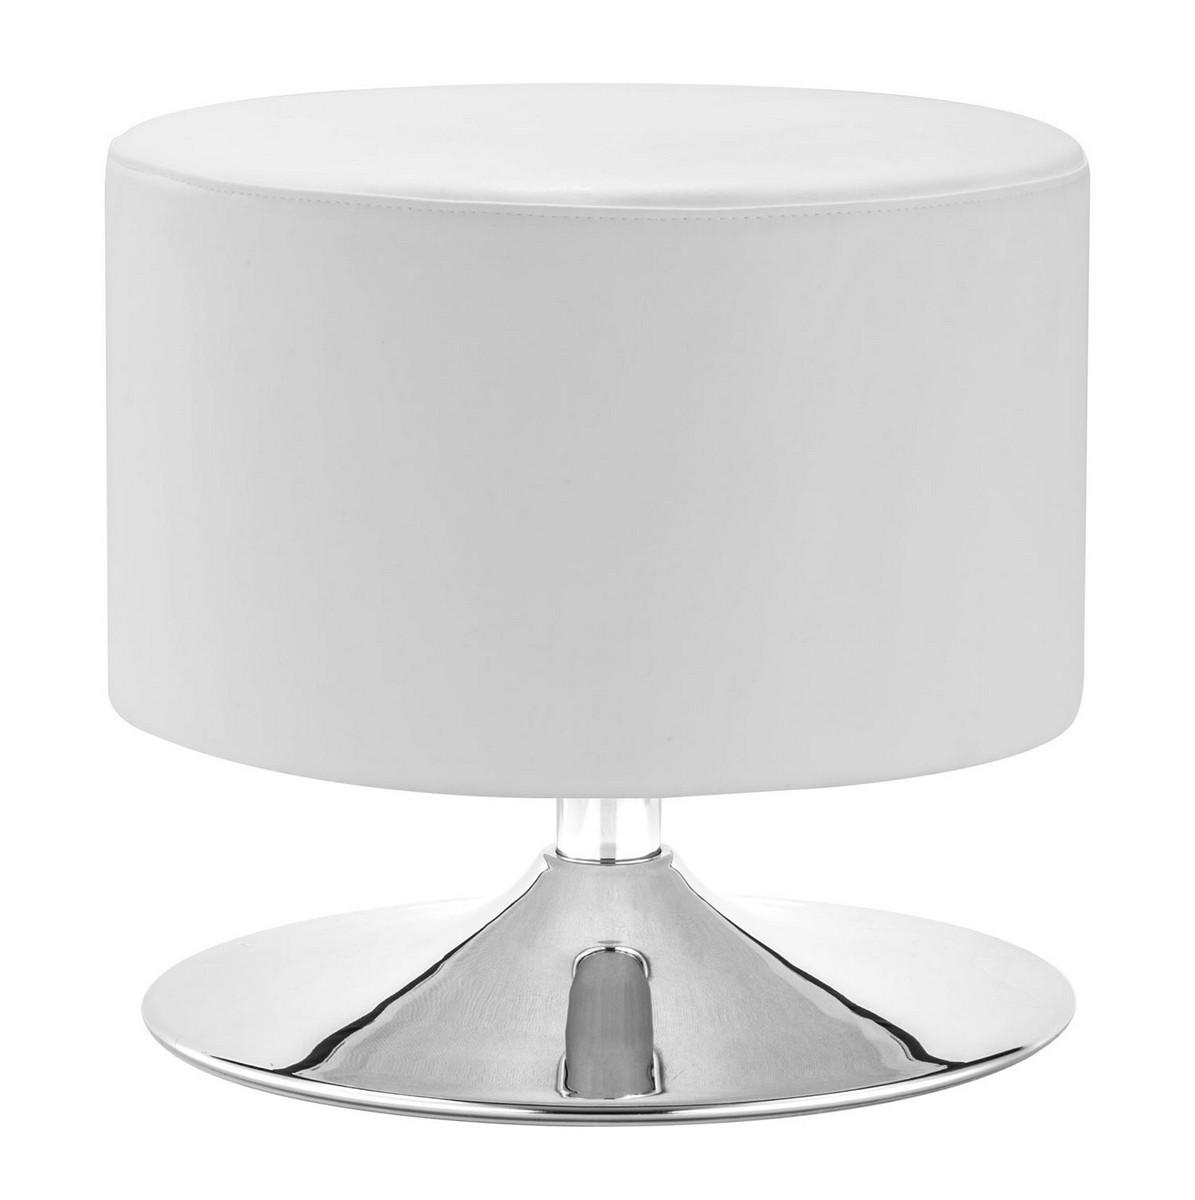 Zuo Modern Plump Ottoman - White